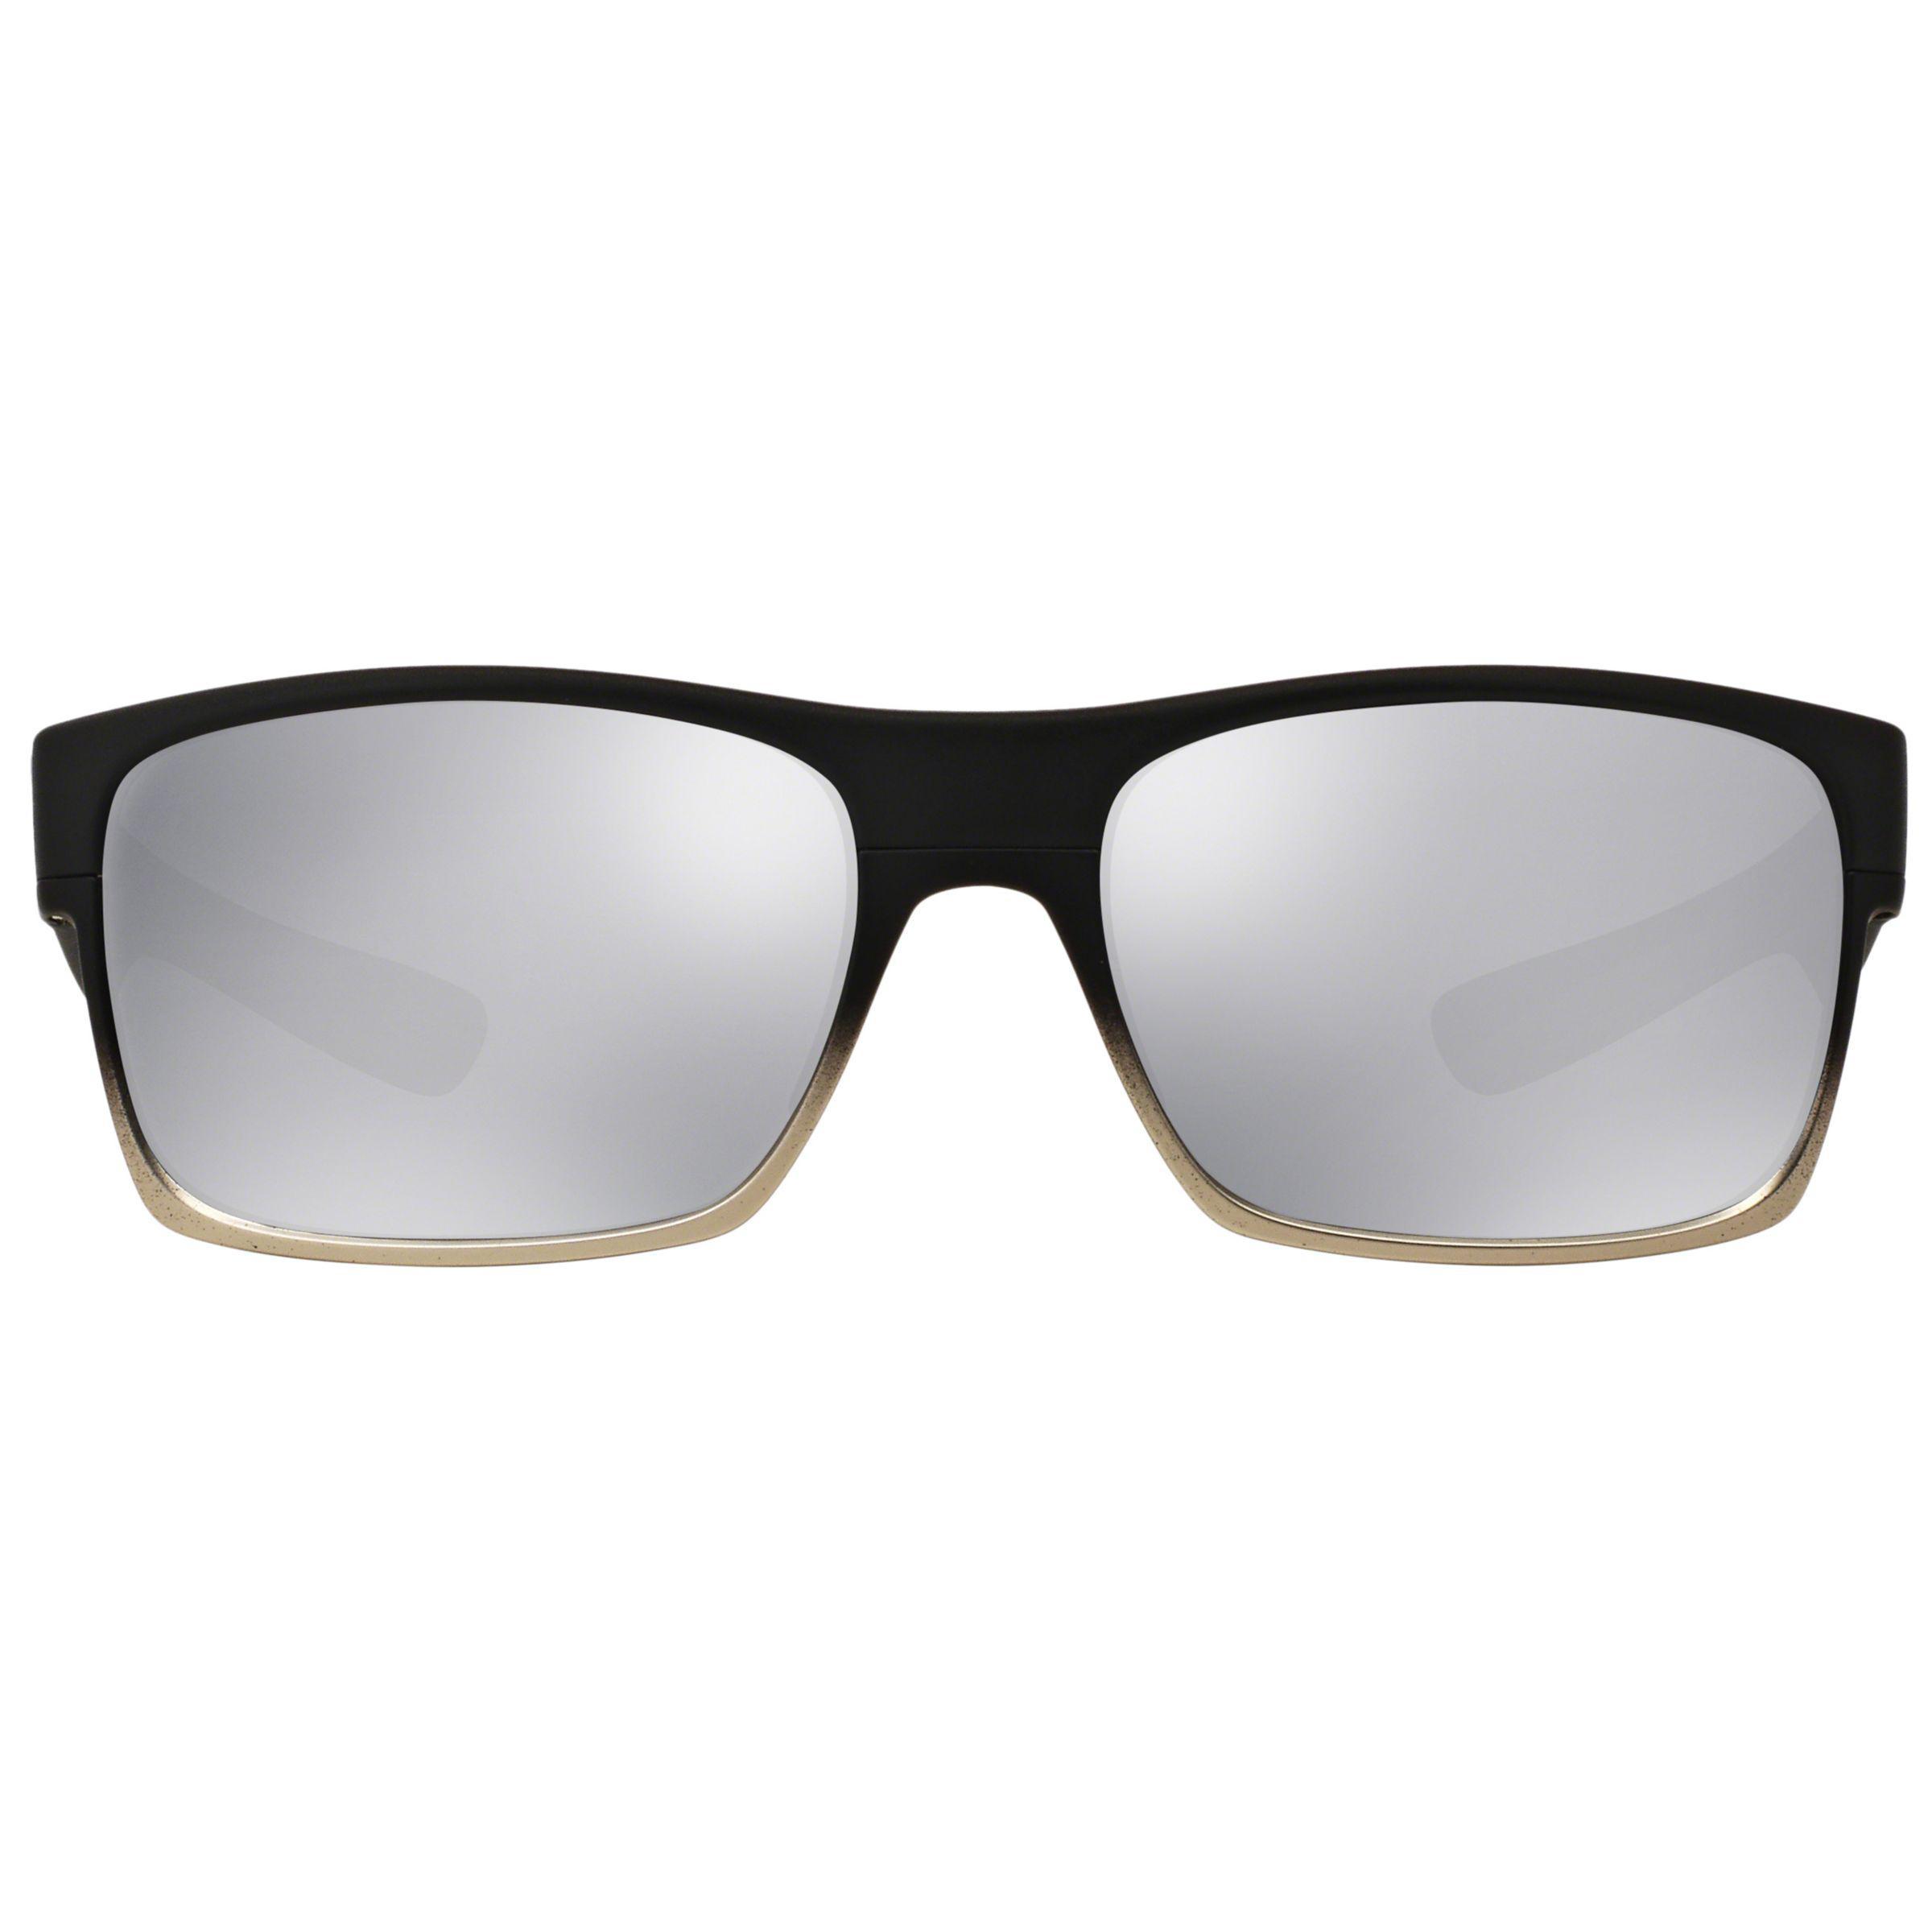 7ae56ec073 Oakley Oo9189 Two Face Rectangular Sunglasses in Black for Men - Lyst